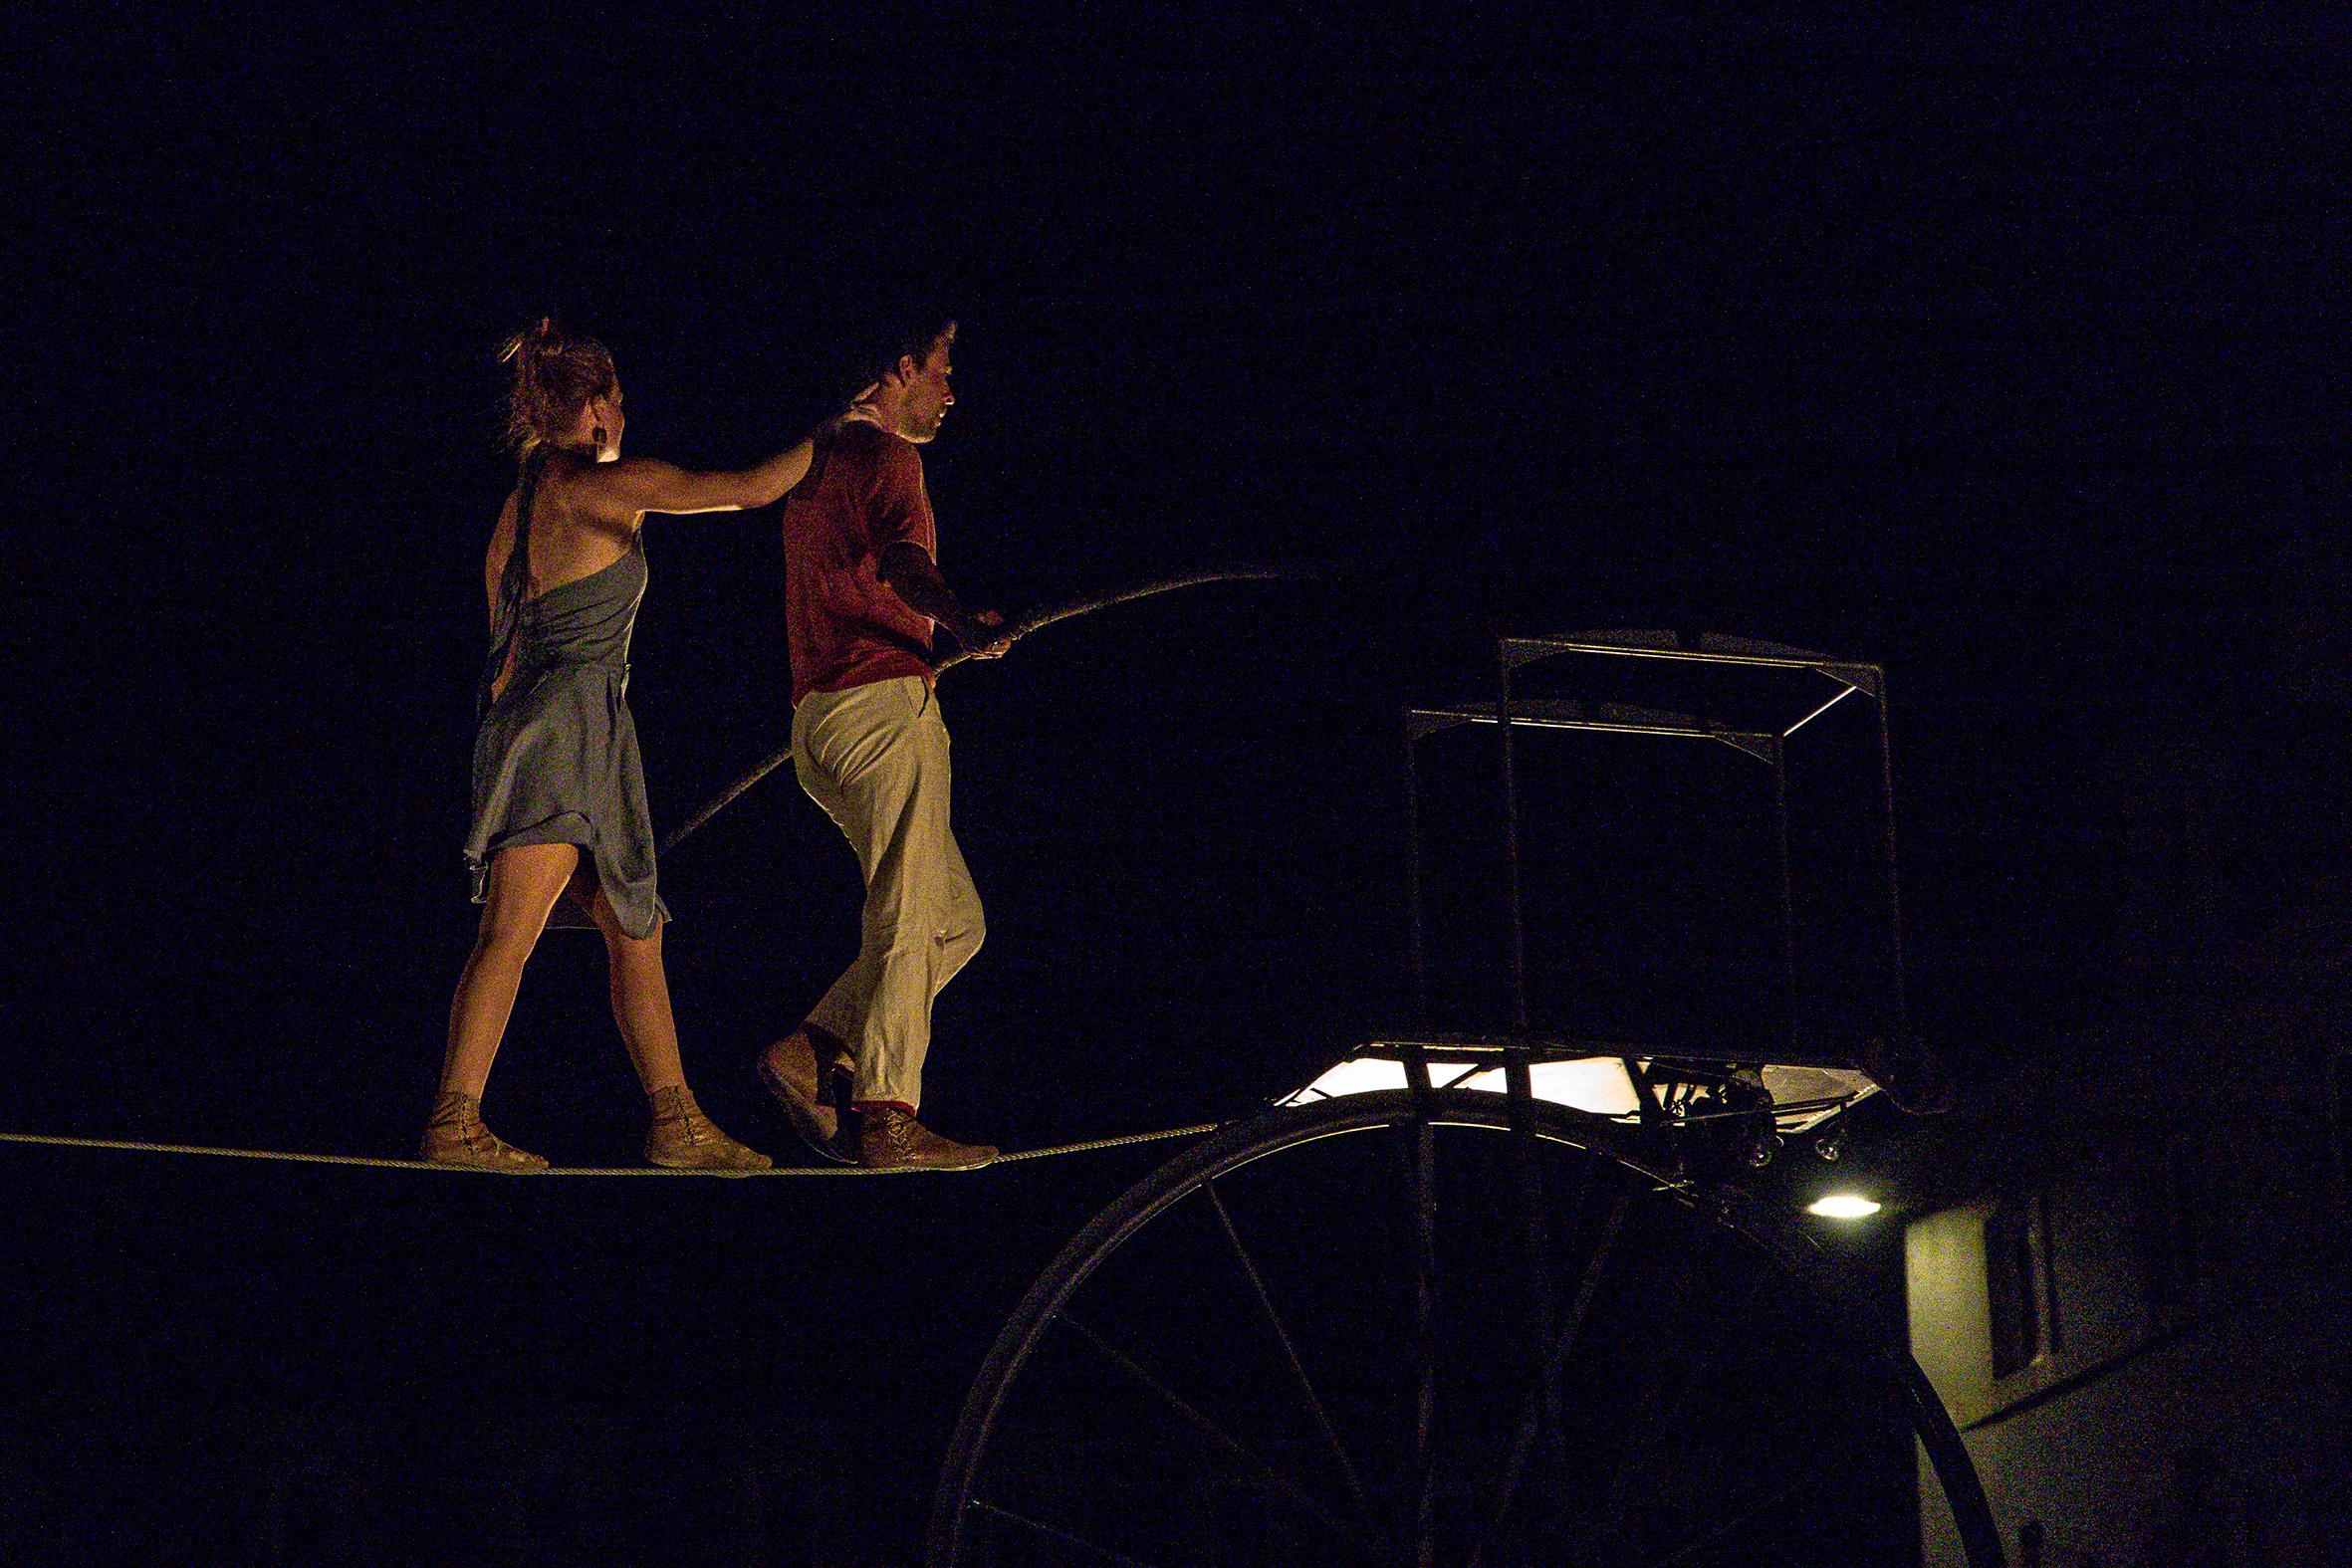 spectacles-sodade-cirque-rouage-mirabelle-metz-2015-marie-colette-becker-06